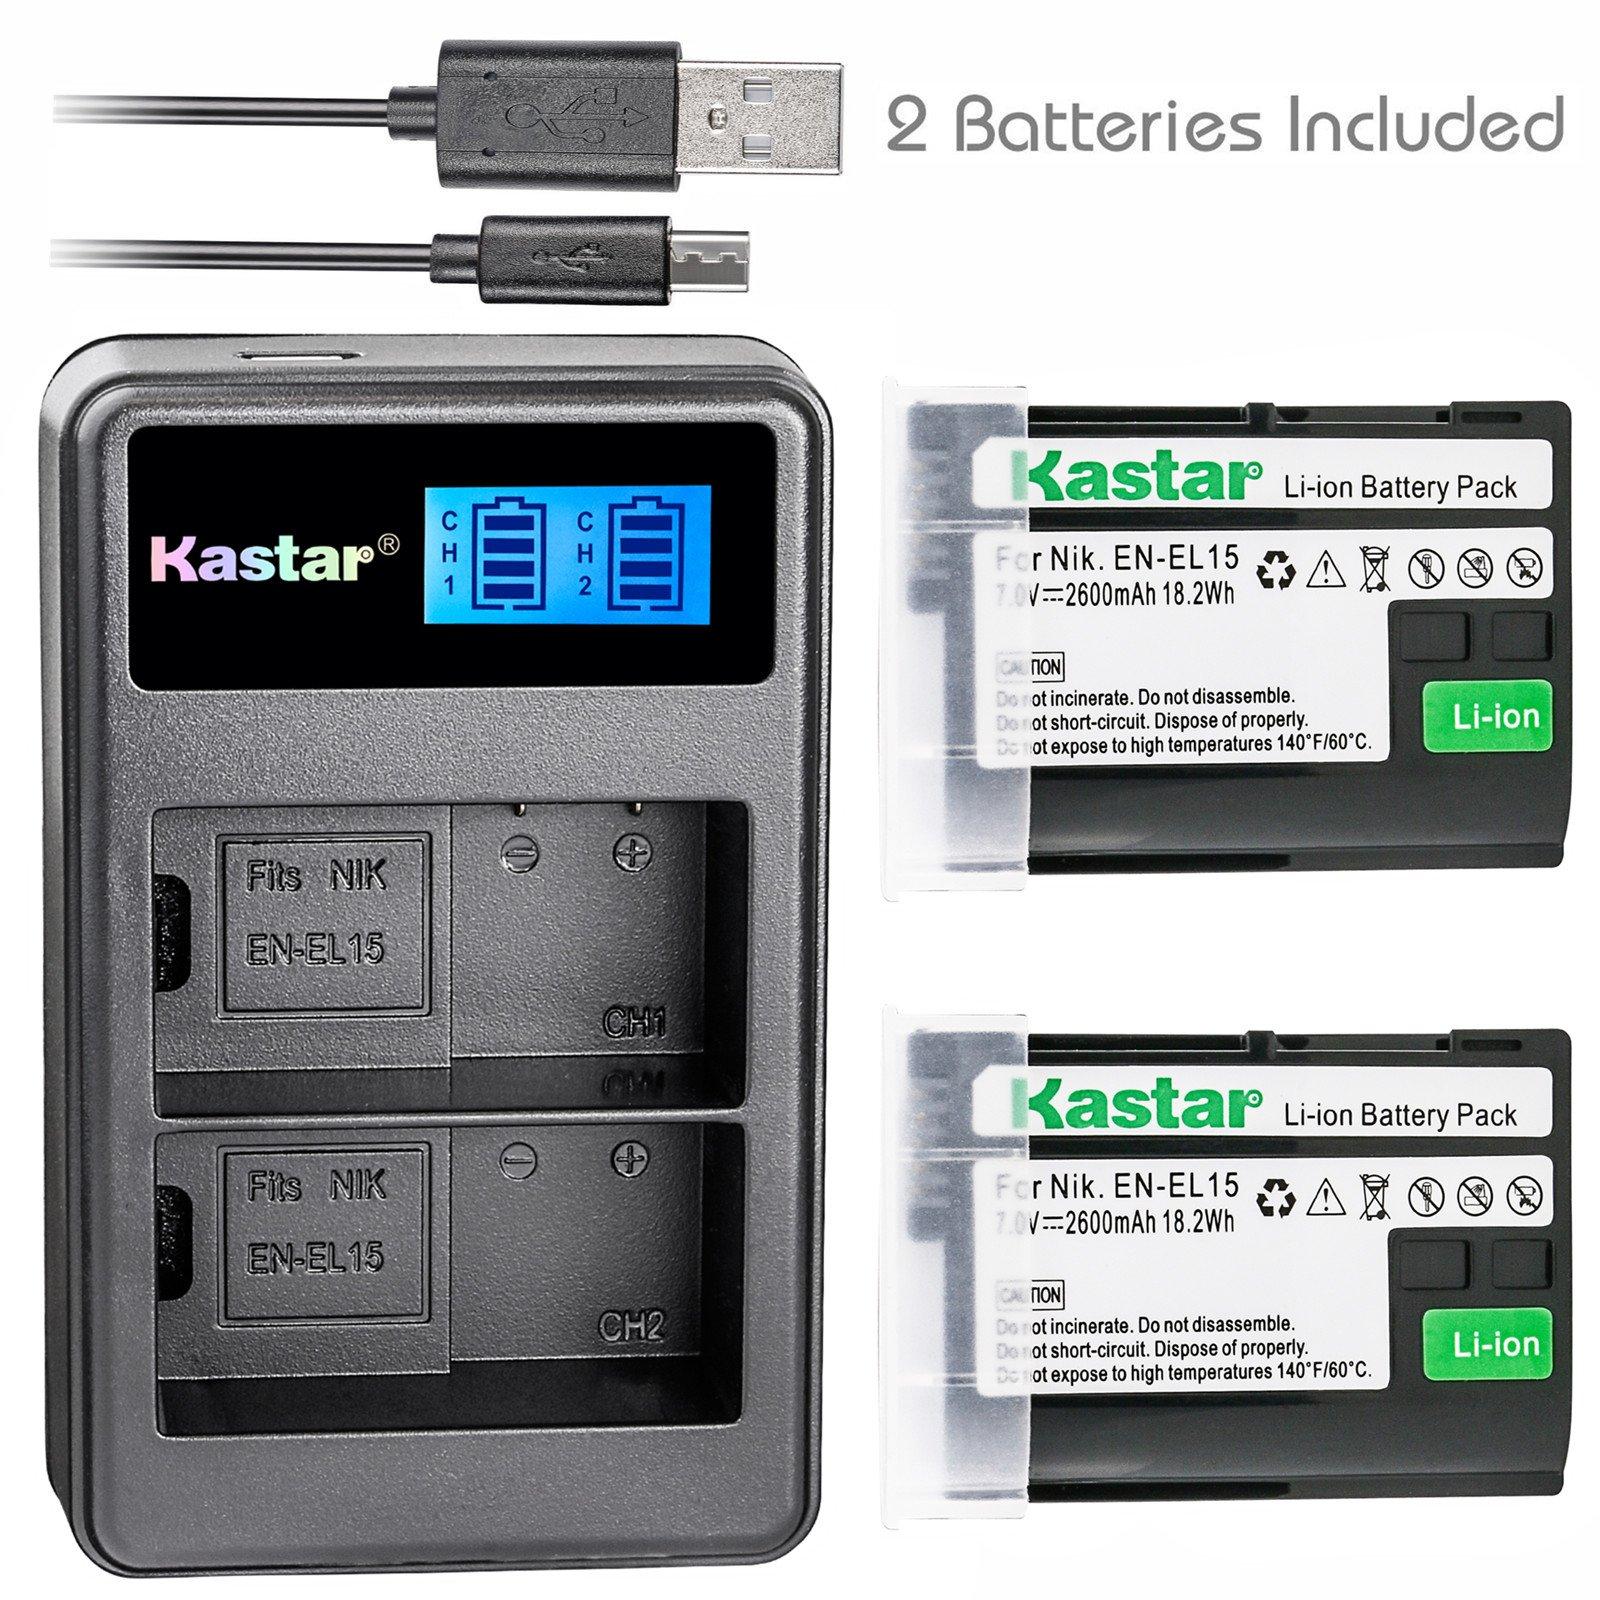 Kastar Battery (X2) & LCD Dual Slim Charger for Nikon EN-EL15, ENEL15 and Nikon 1 V1, D500, D600, D610, D750, D800, D7000, D7100, D800, D800E DSLR Camera, Grip MB-D11, MB-D12, MB-D14, MB-D15, MB-D16